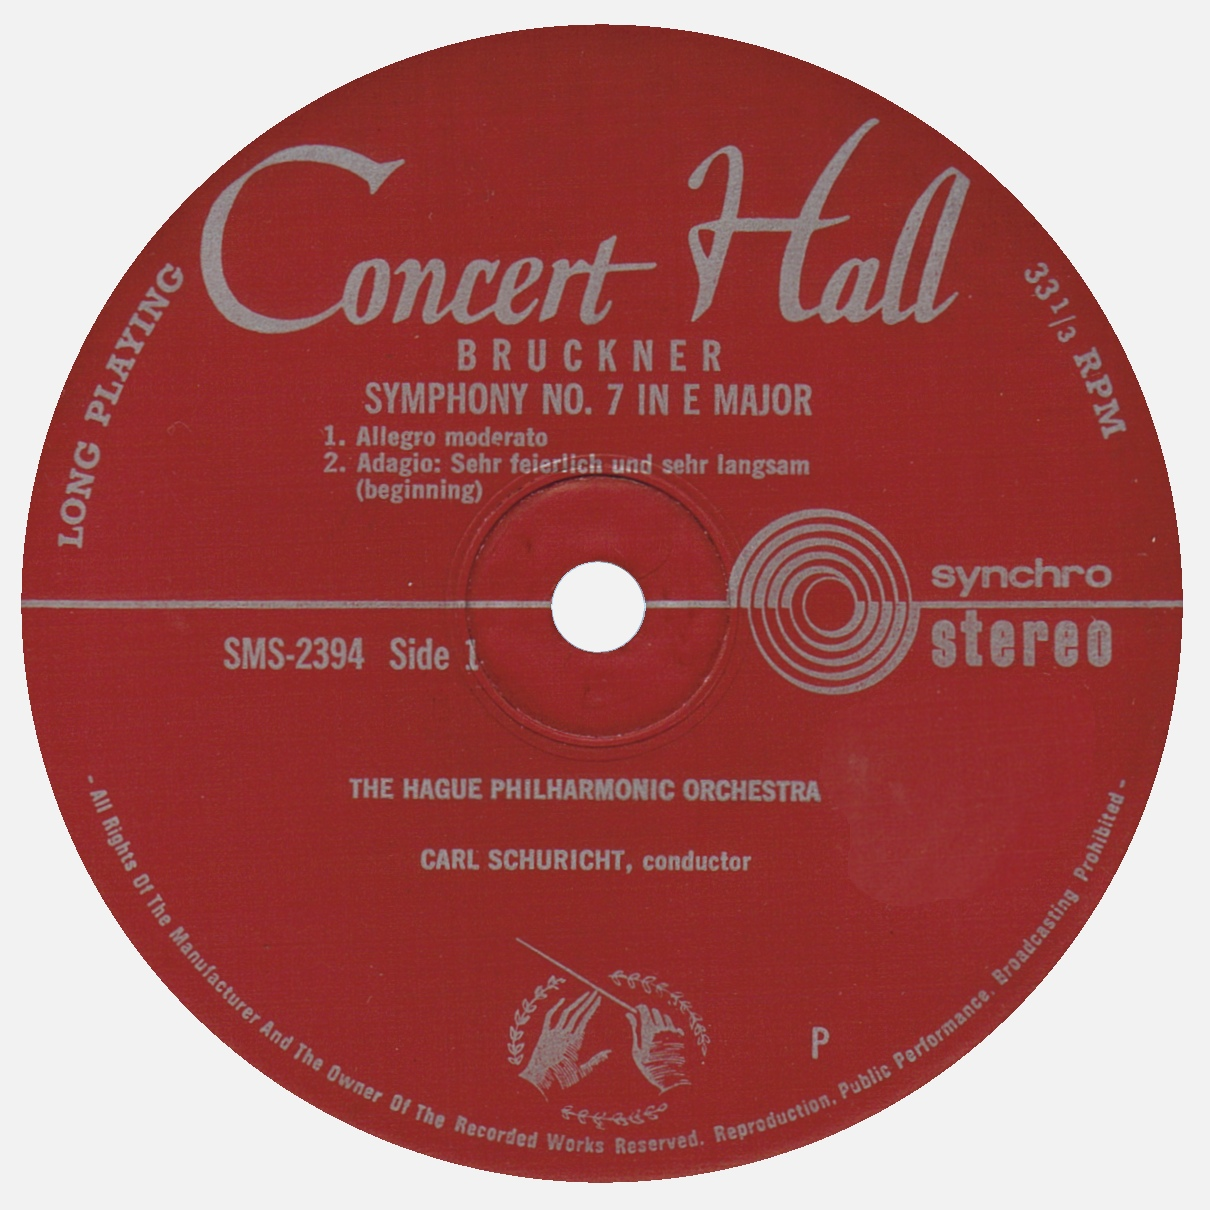 Étiquette recto du disque Concert Hall / Musical Masterpiece Society SMS 2304